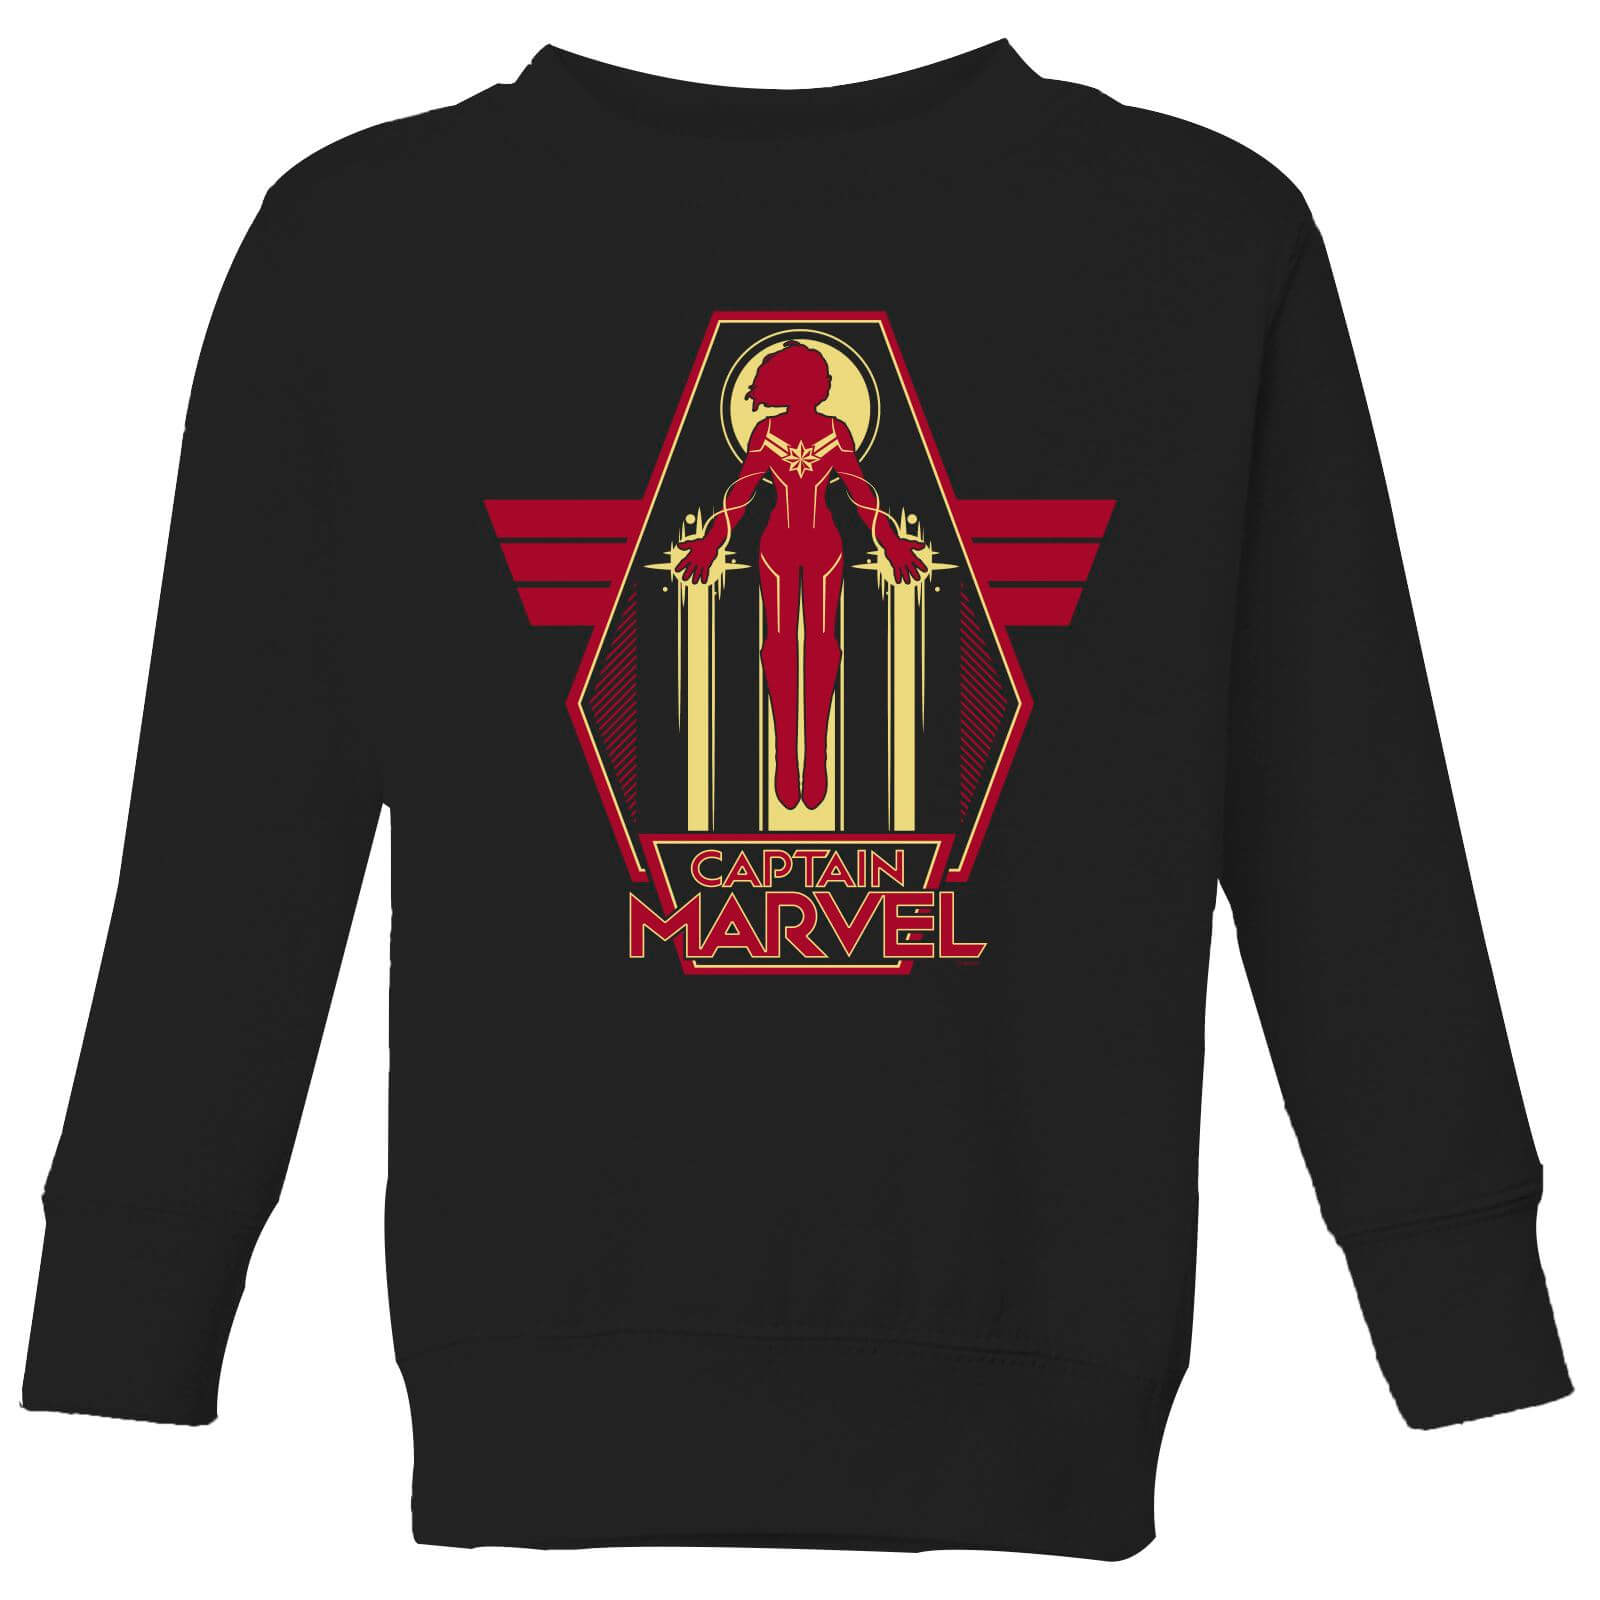 Captain Marvel Flying Warrior Kids' Sweatshirt - Black - 11-12 Years - Black